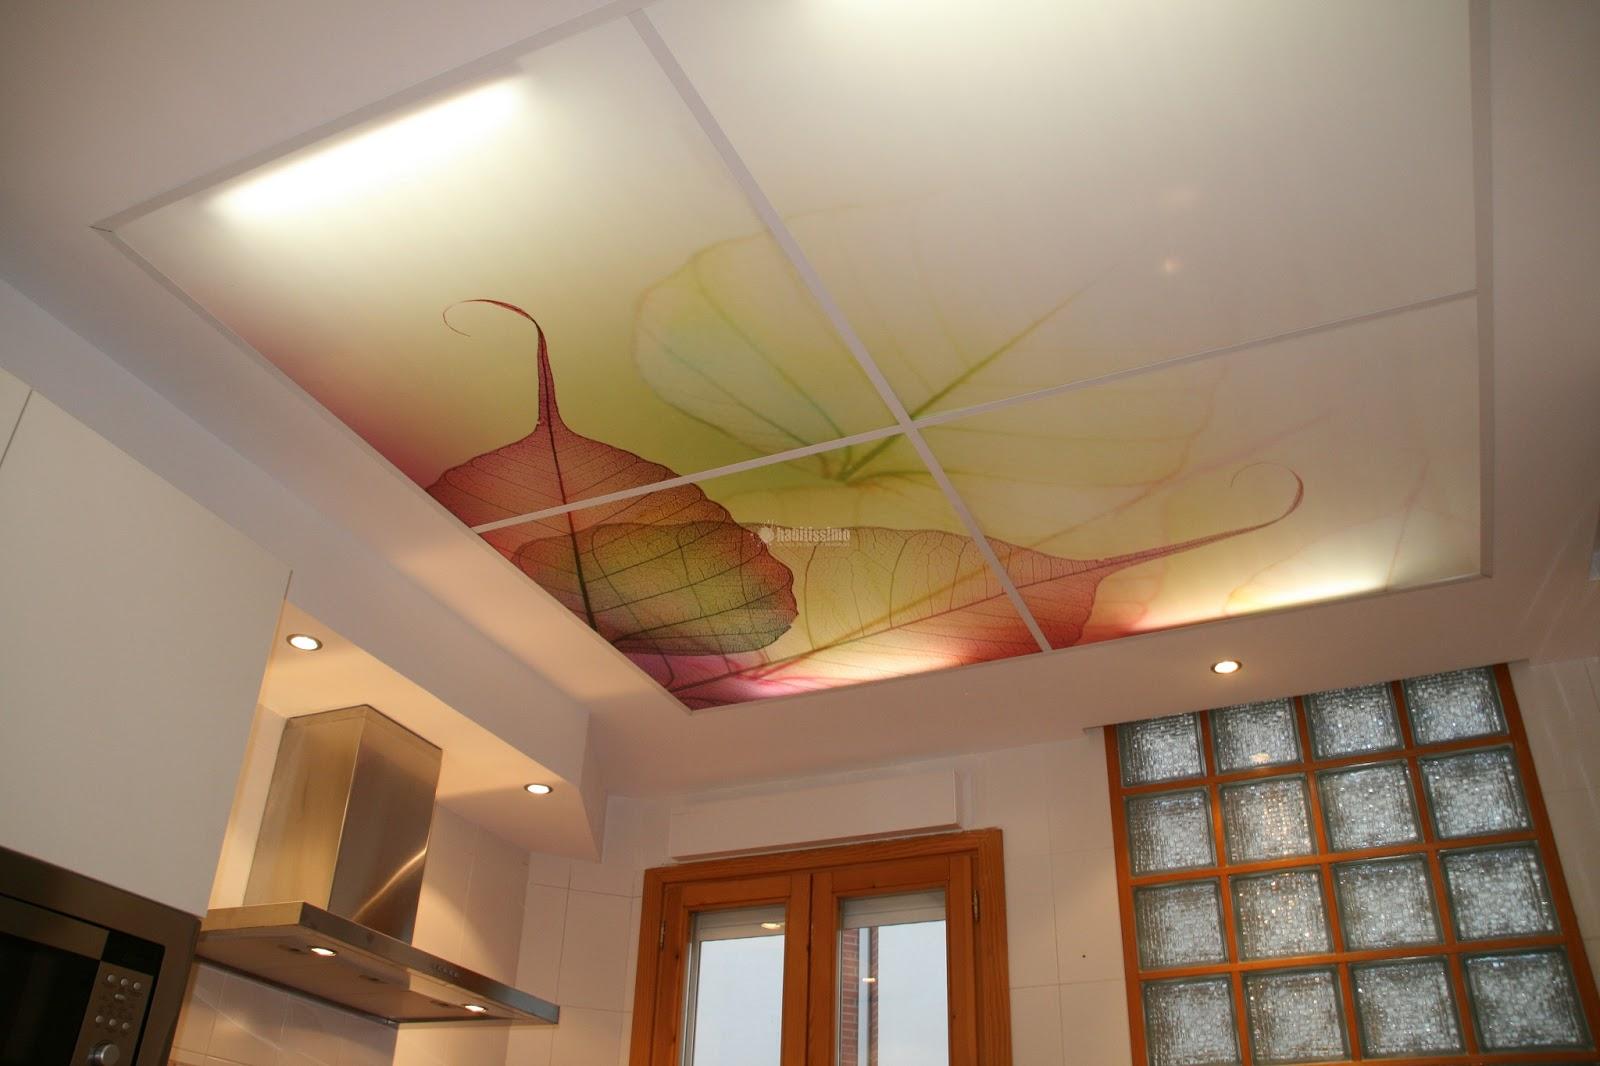 Pinturas y decoraci n 35 como pintar techo cocina for Pintar techo cocina